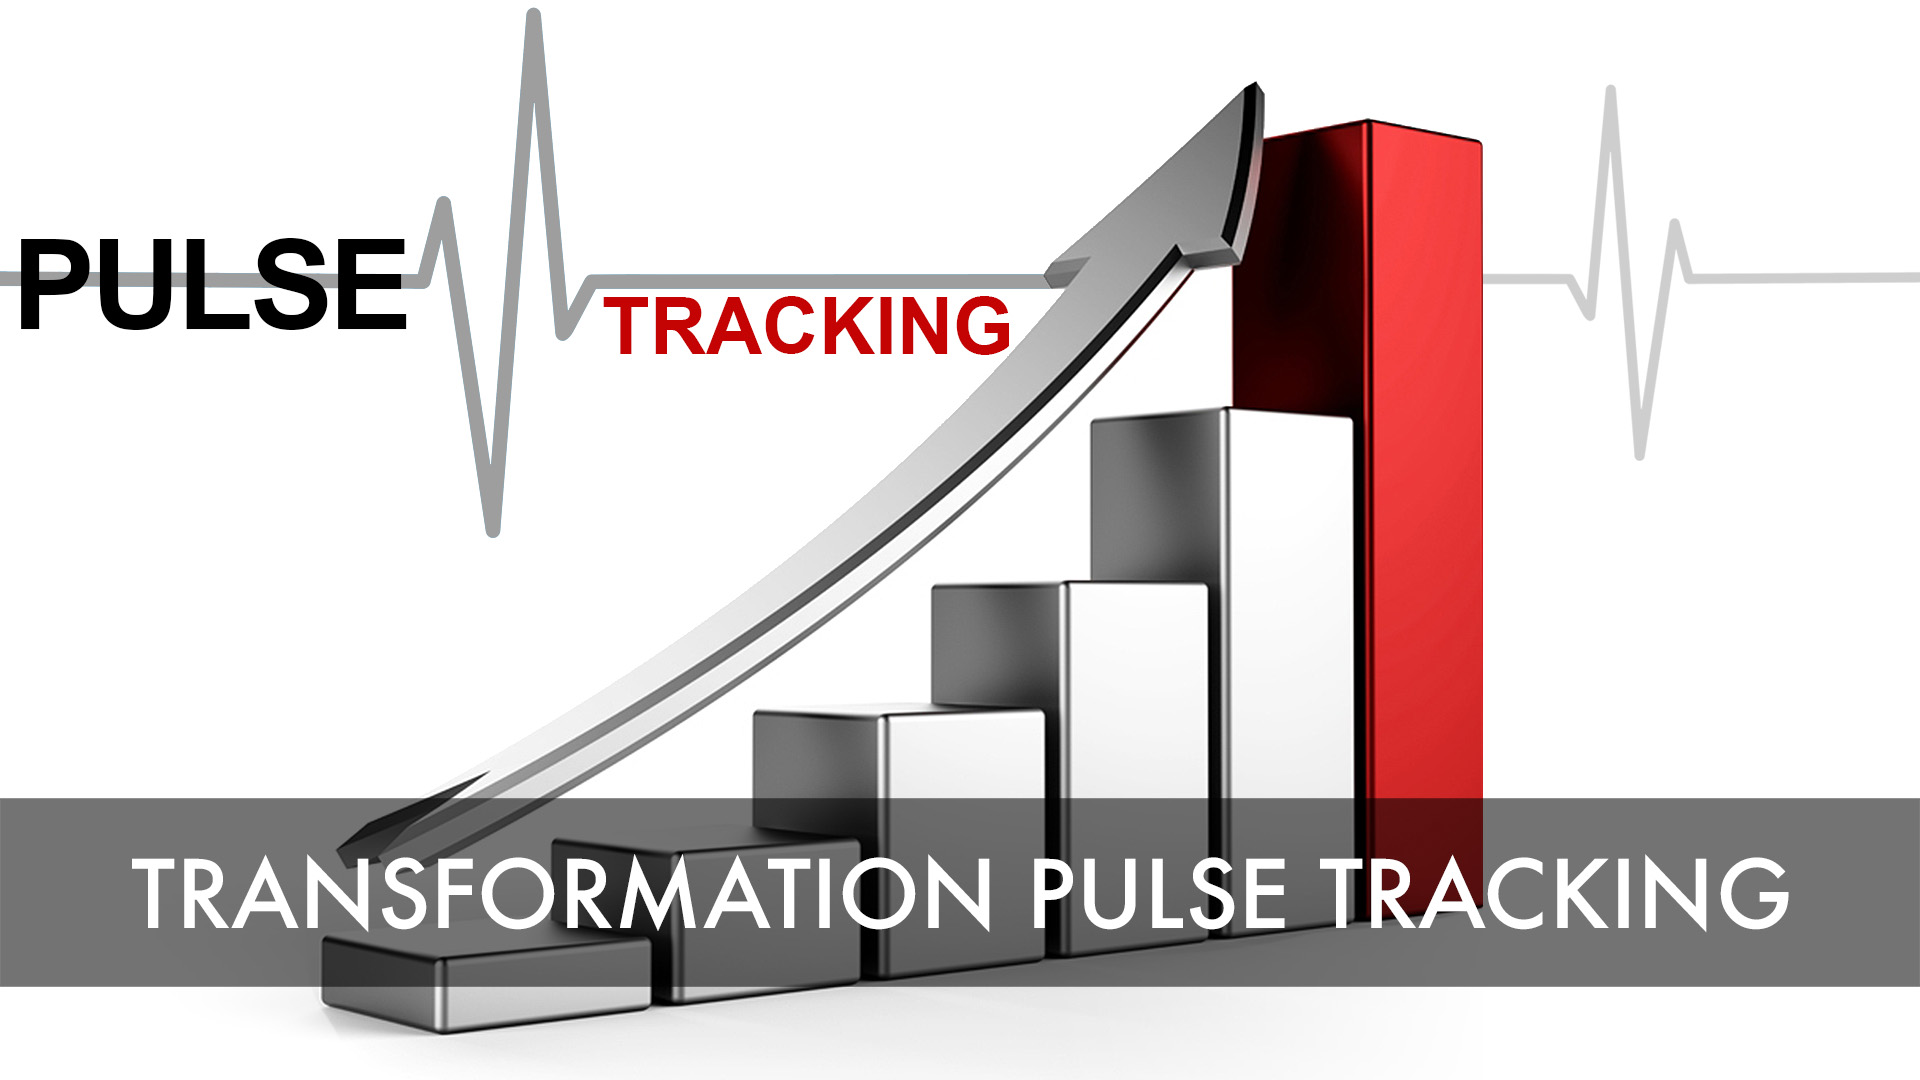 Transformation Pulse Tracking Thumbnail.jpg